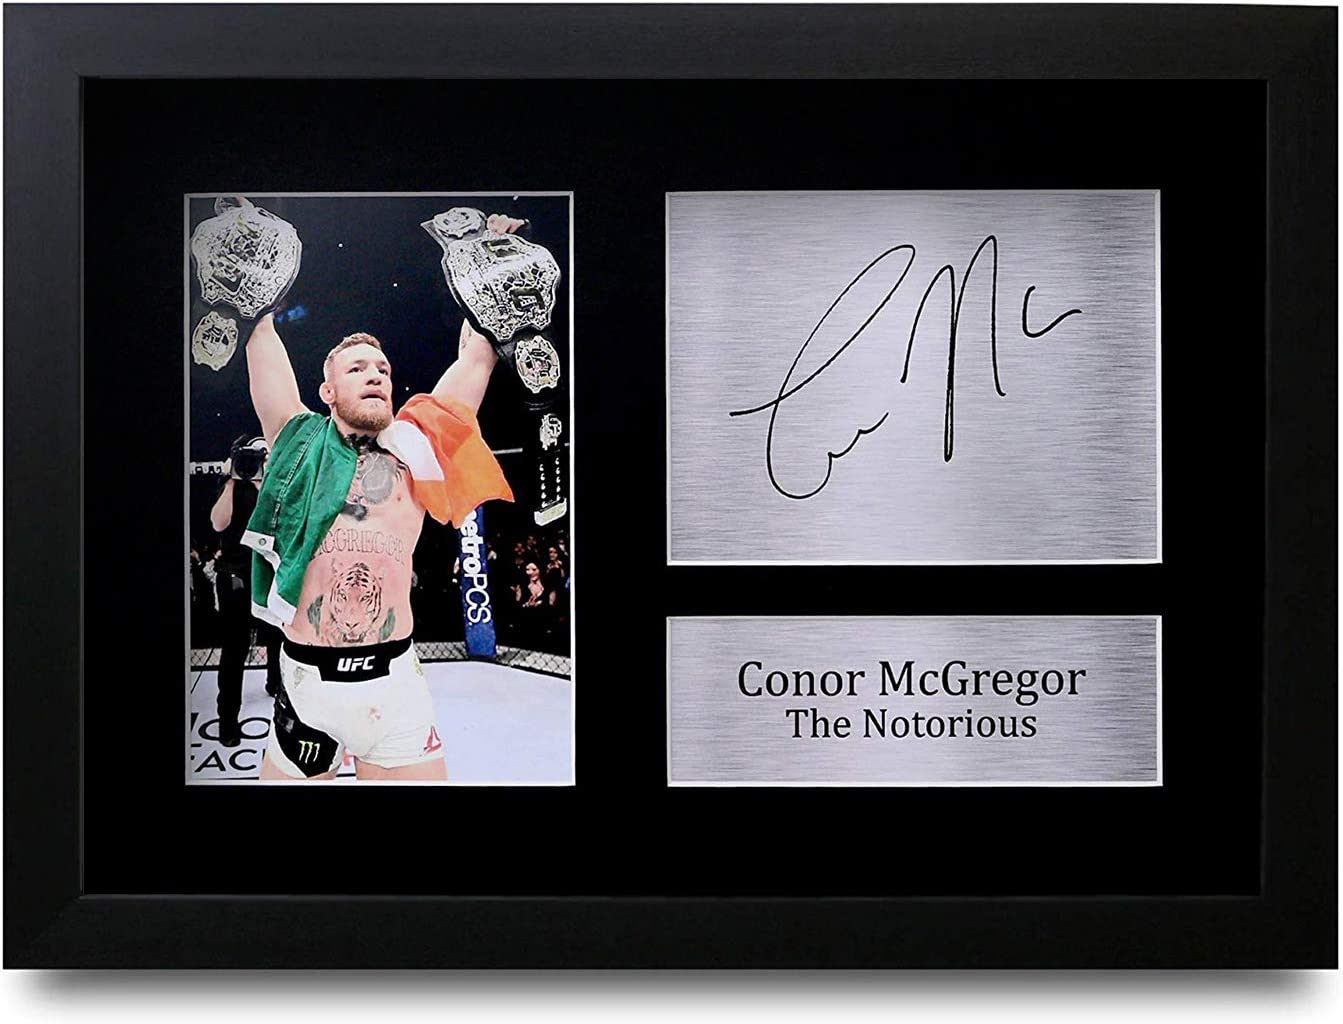 HWC Trading Conor Mcgregor A4 Encadr/é Sign/é Image Autographe Imprim/é Impression Photo Cadeau DAffichage pour Ventilateurs UFC